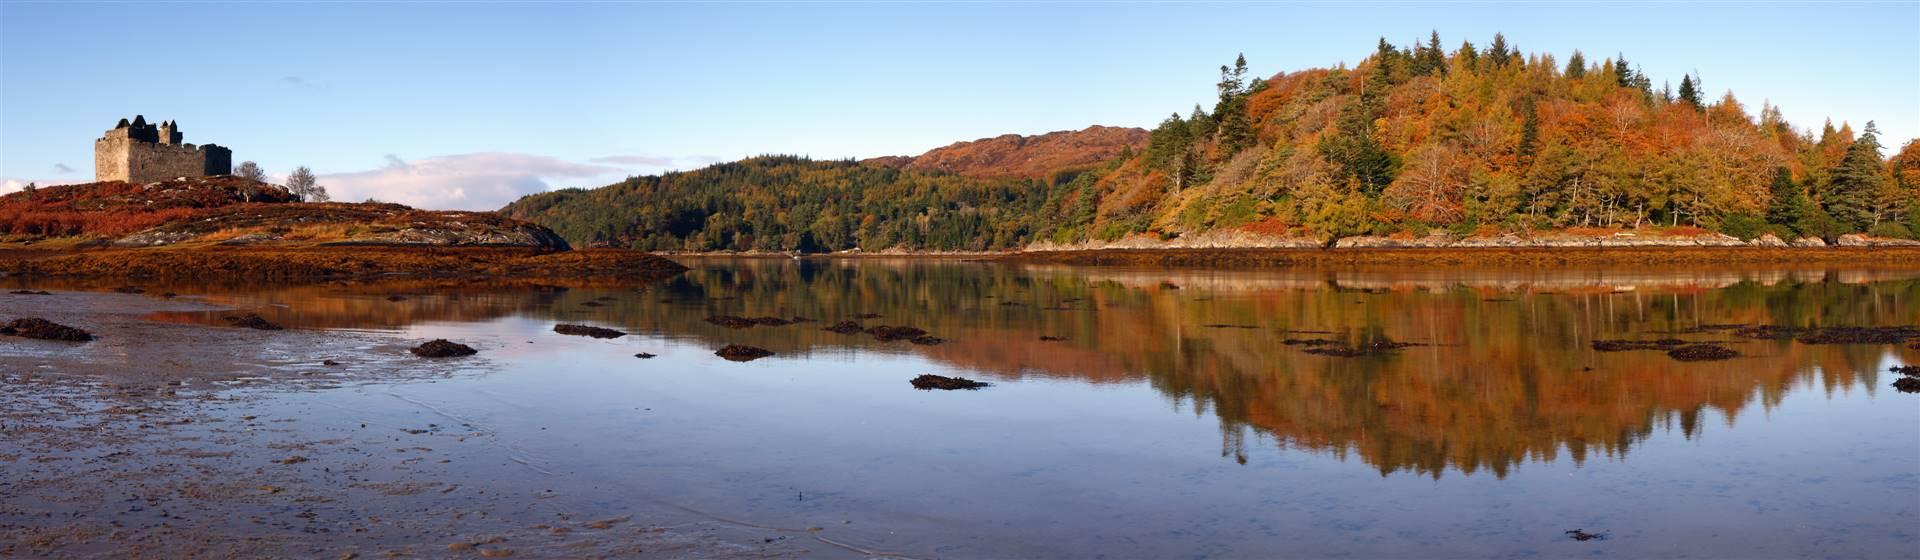 "<img src=""autumn2-shutterstock_63737047.jpeg"" alt=""Scotland in the Autumn""/>"